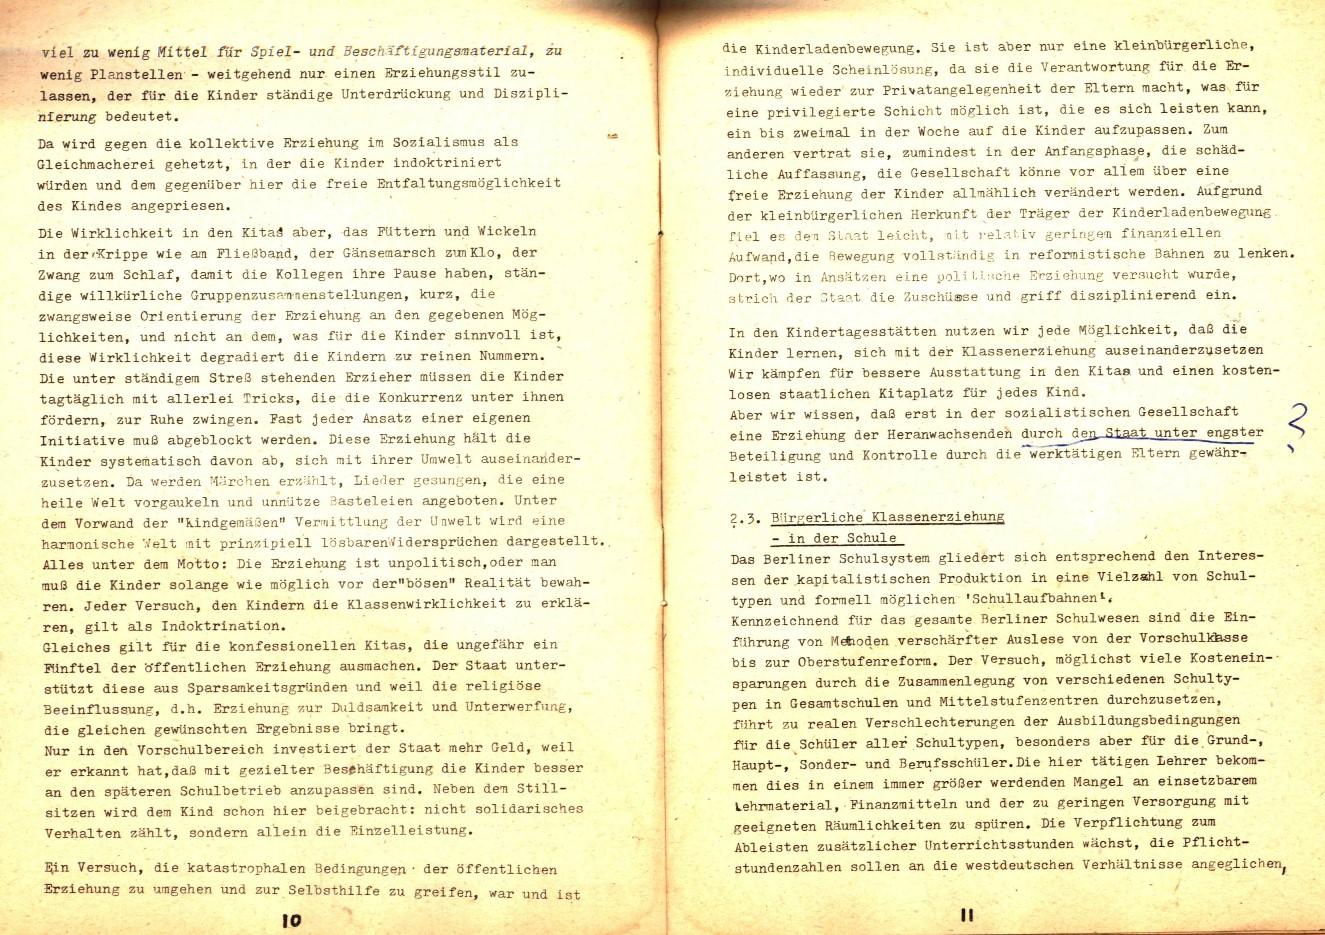 Berlin_BSLE_1975_Grundlagenpapier_07